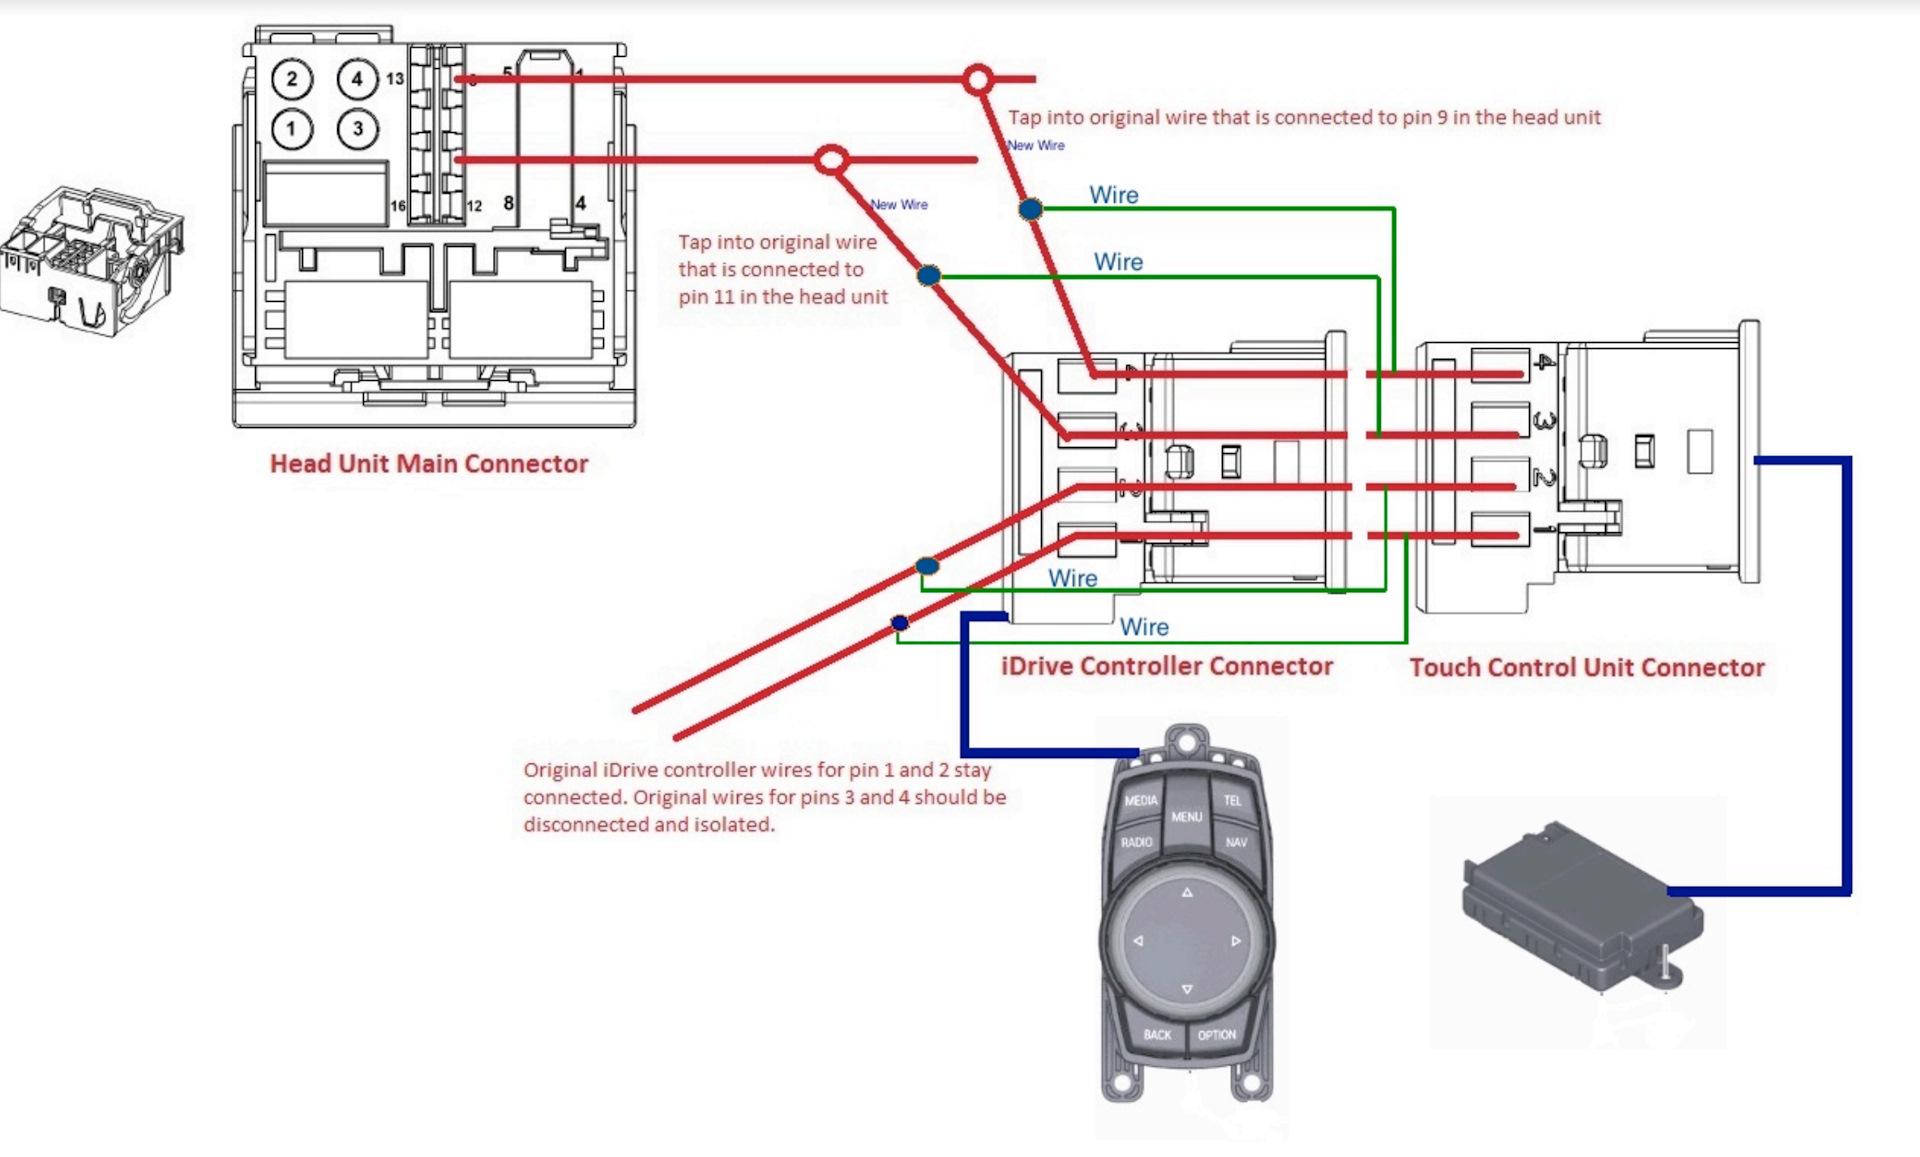 hight resolution of bmw nbt wiring diagram diagram database reg bmw nbt wiring diagram bmw nbt wiring diagram